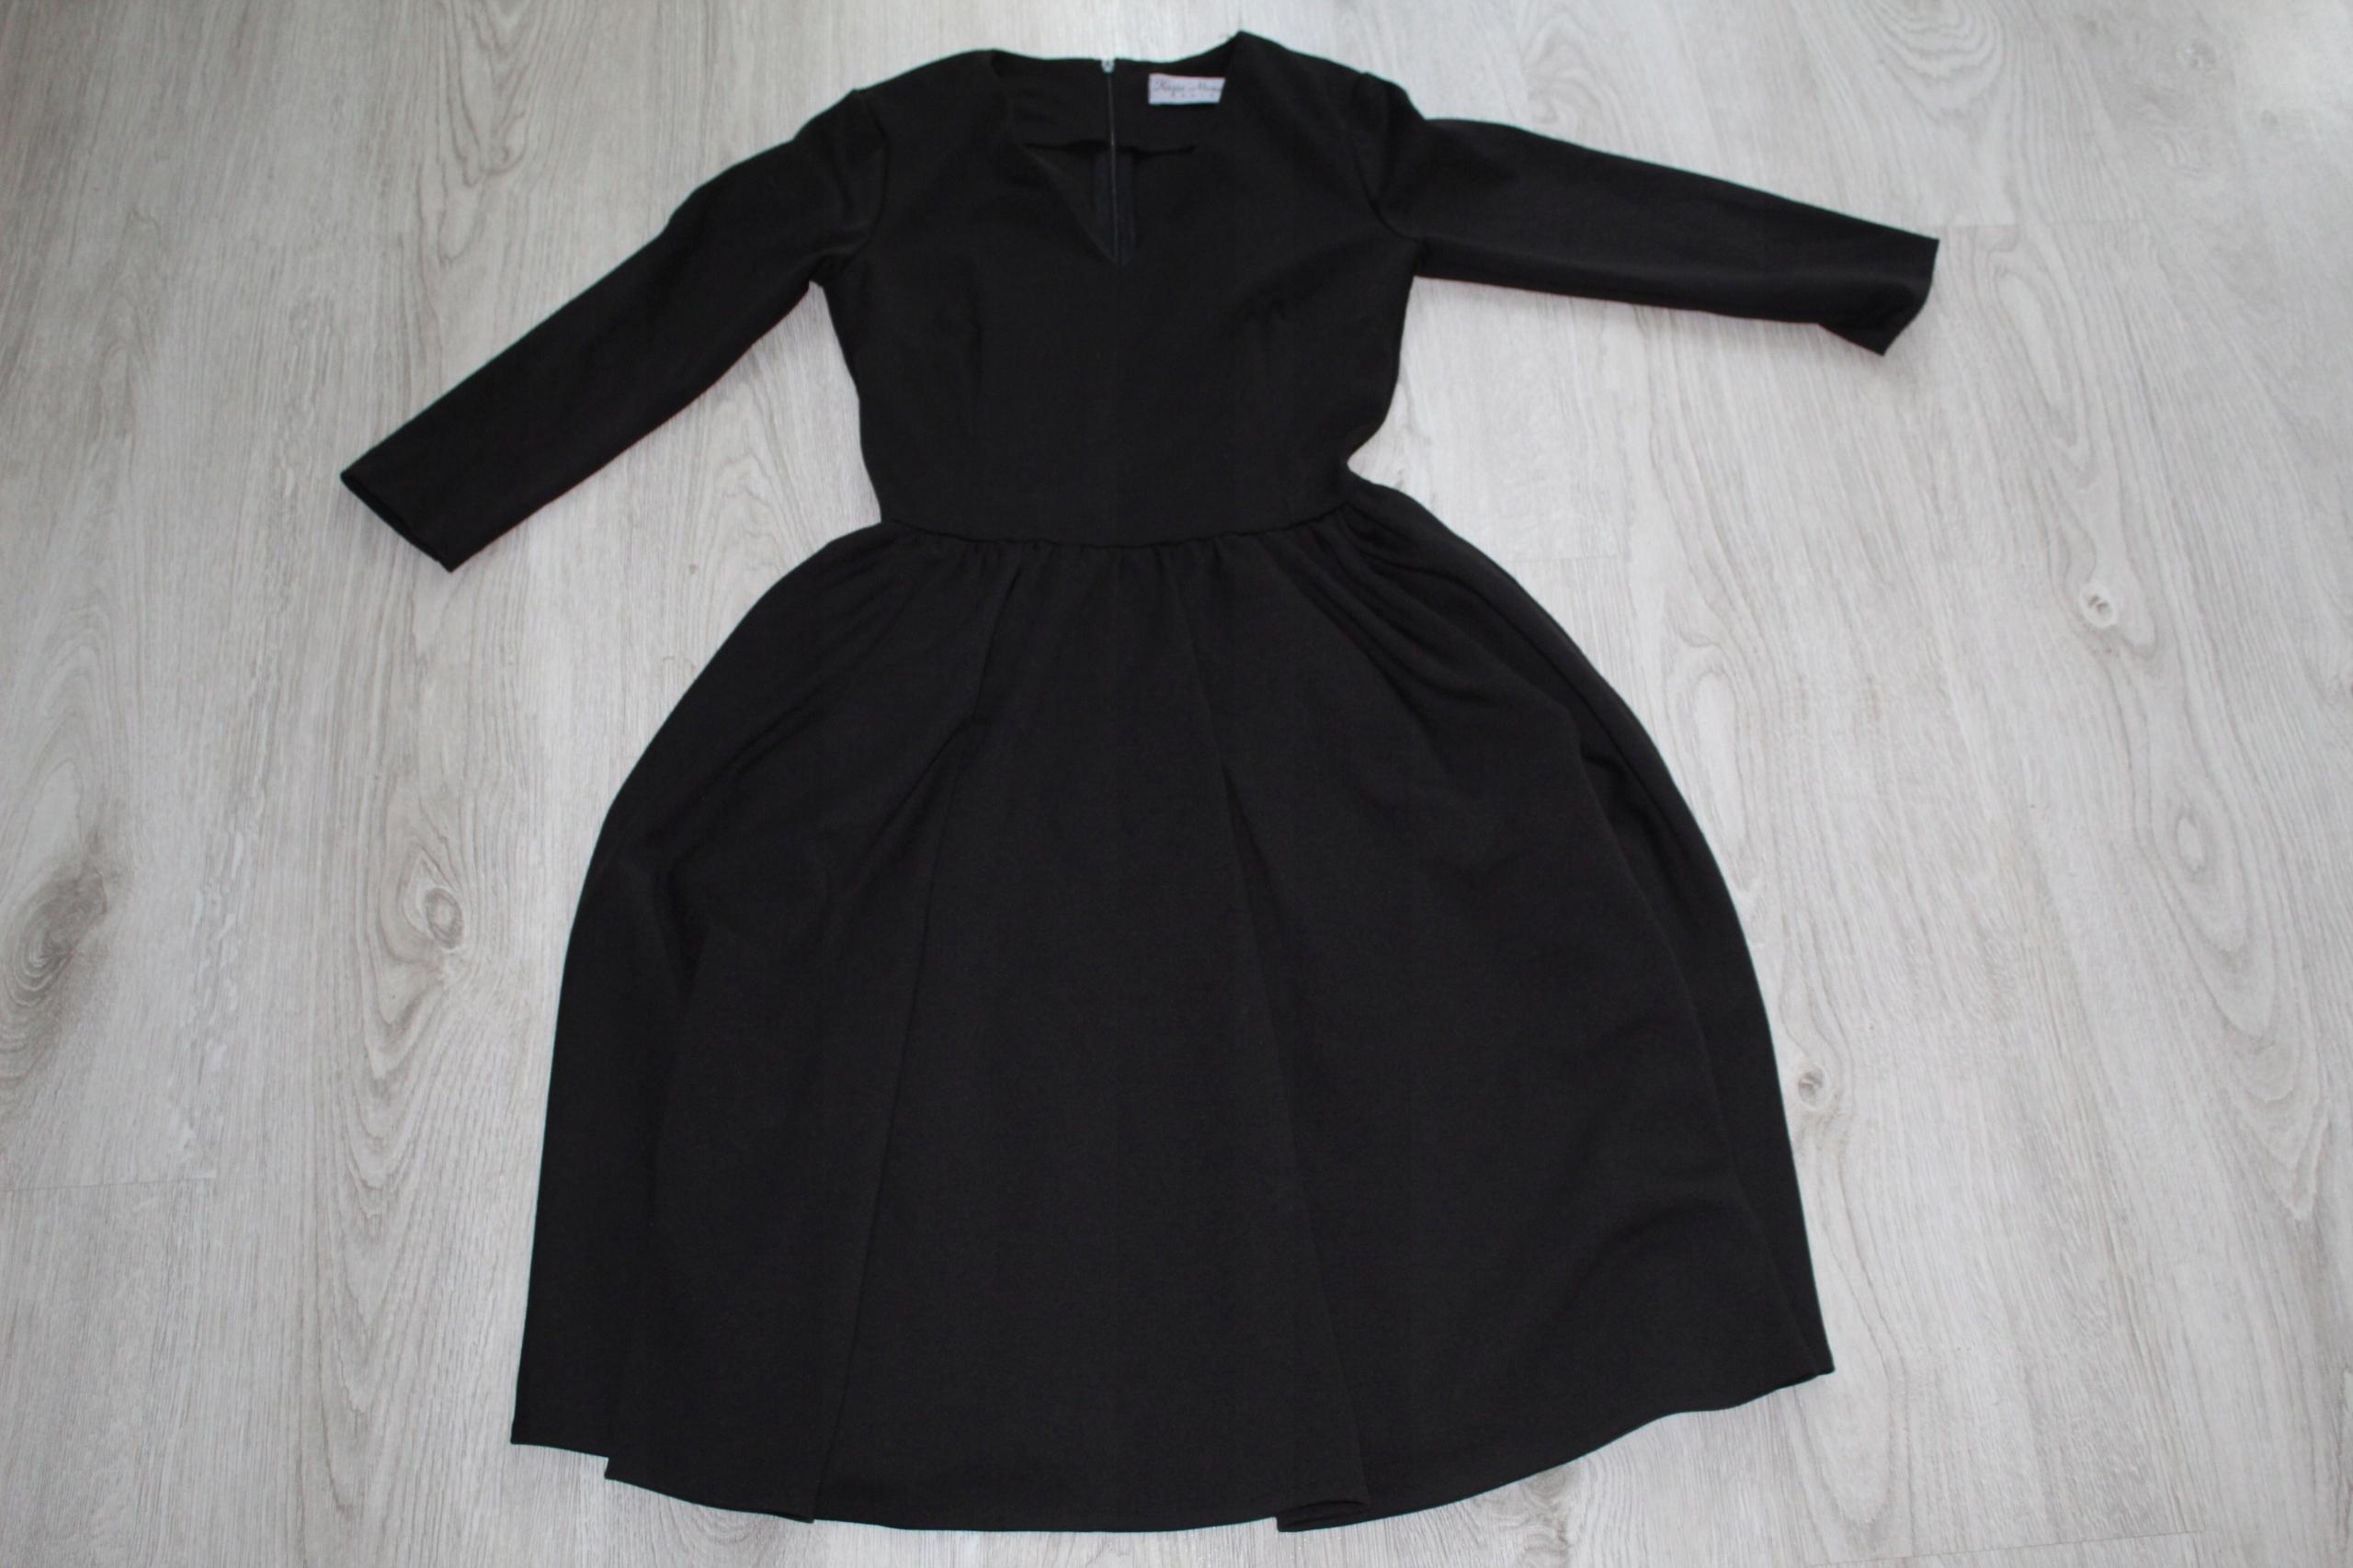 c50f43182d sukienka Kasia Miciak design r. XS idealna - 7604167846 - oficjalne ...